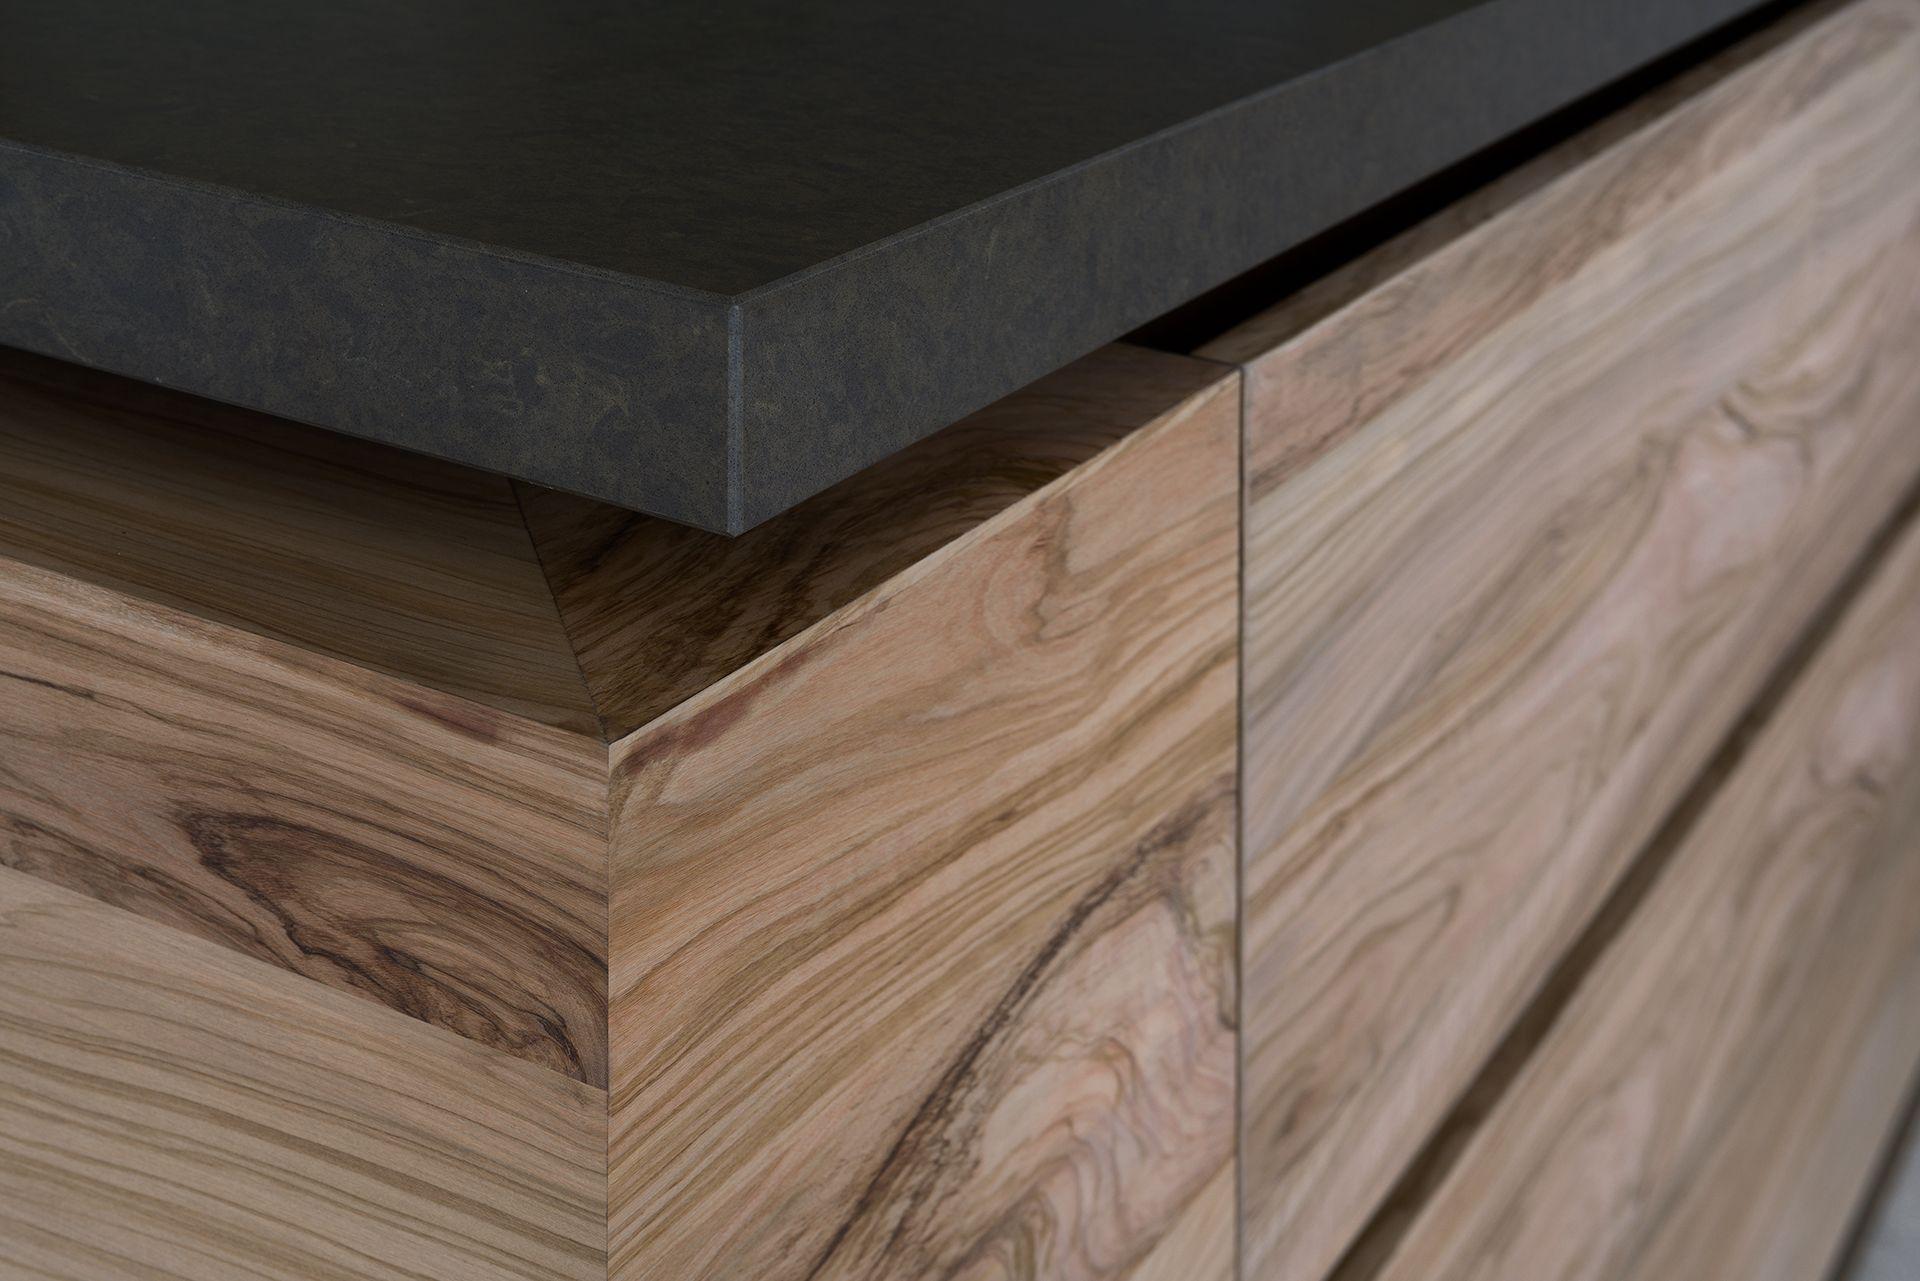 Donker aanrechtblad houten keuken keuken houten